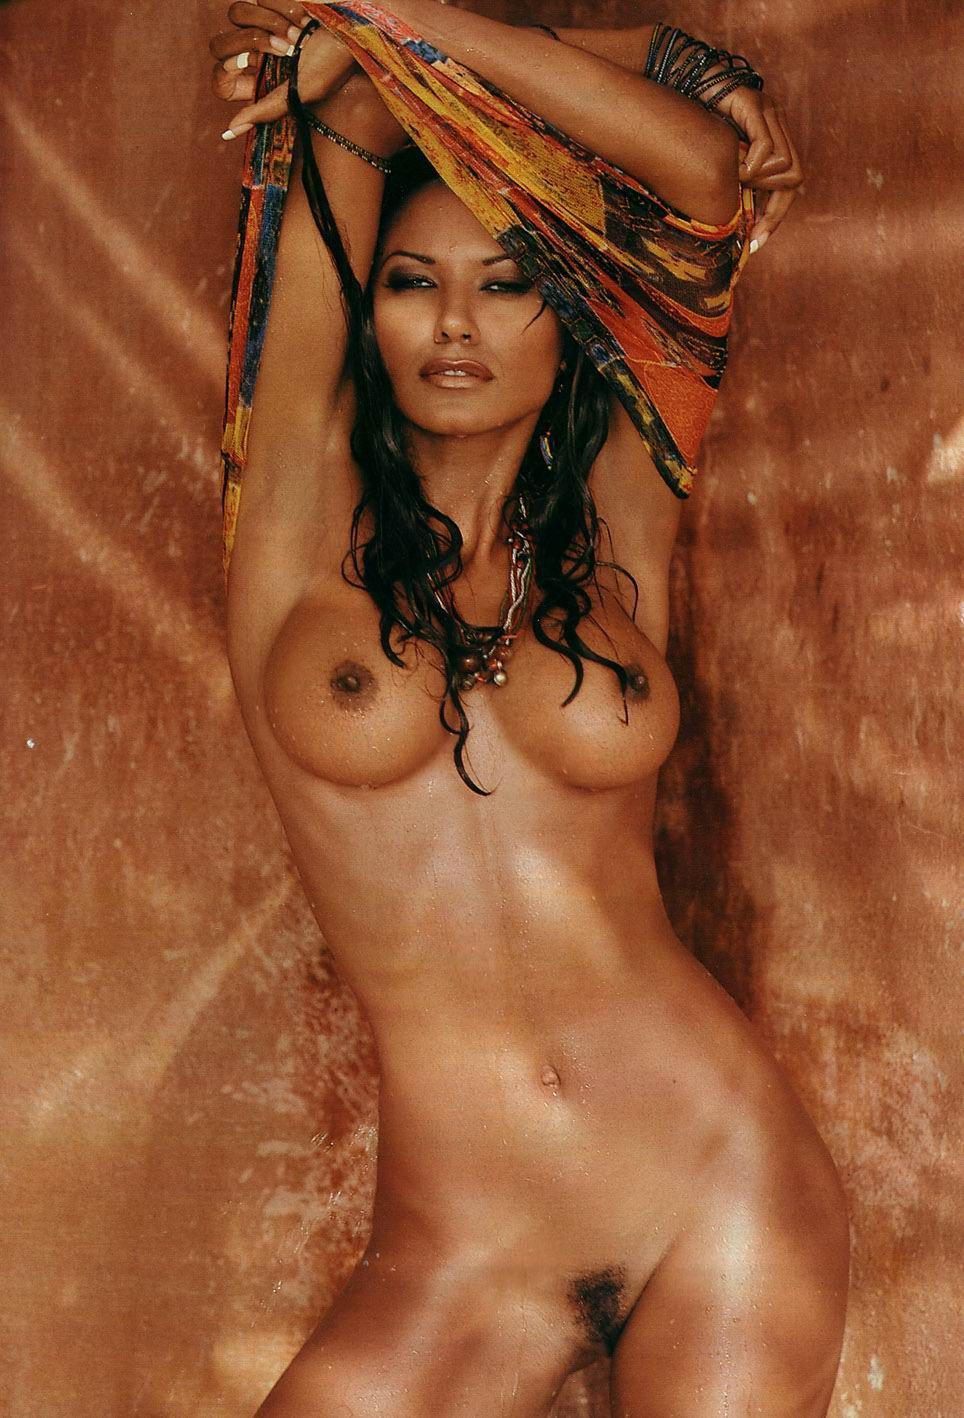 Traci bingham nude in playboy